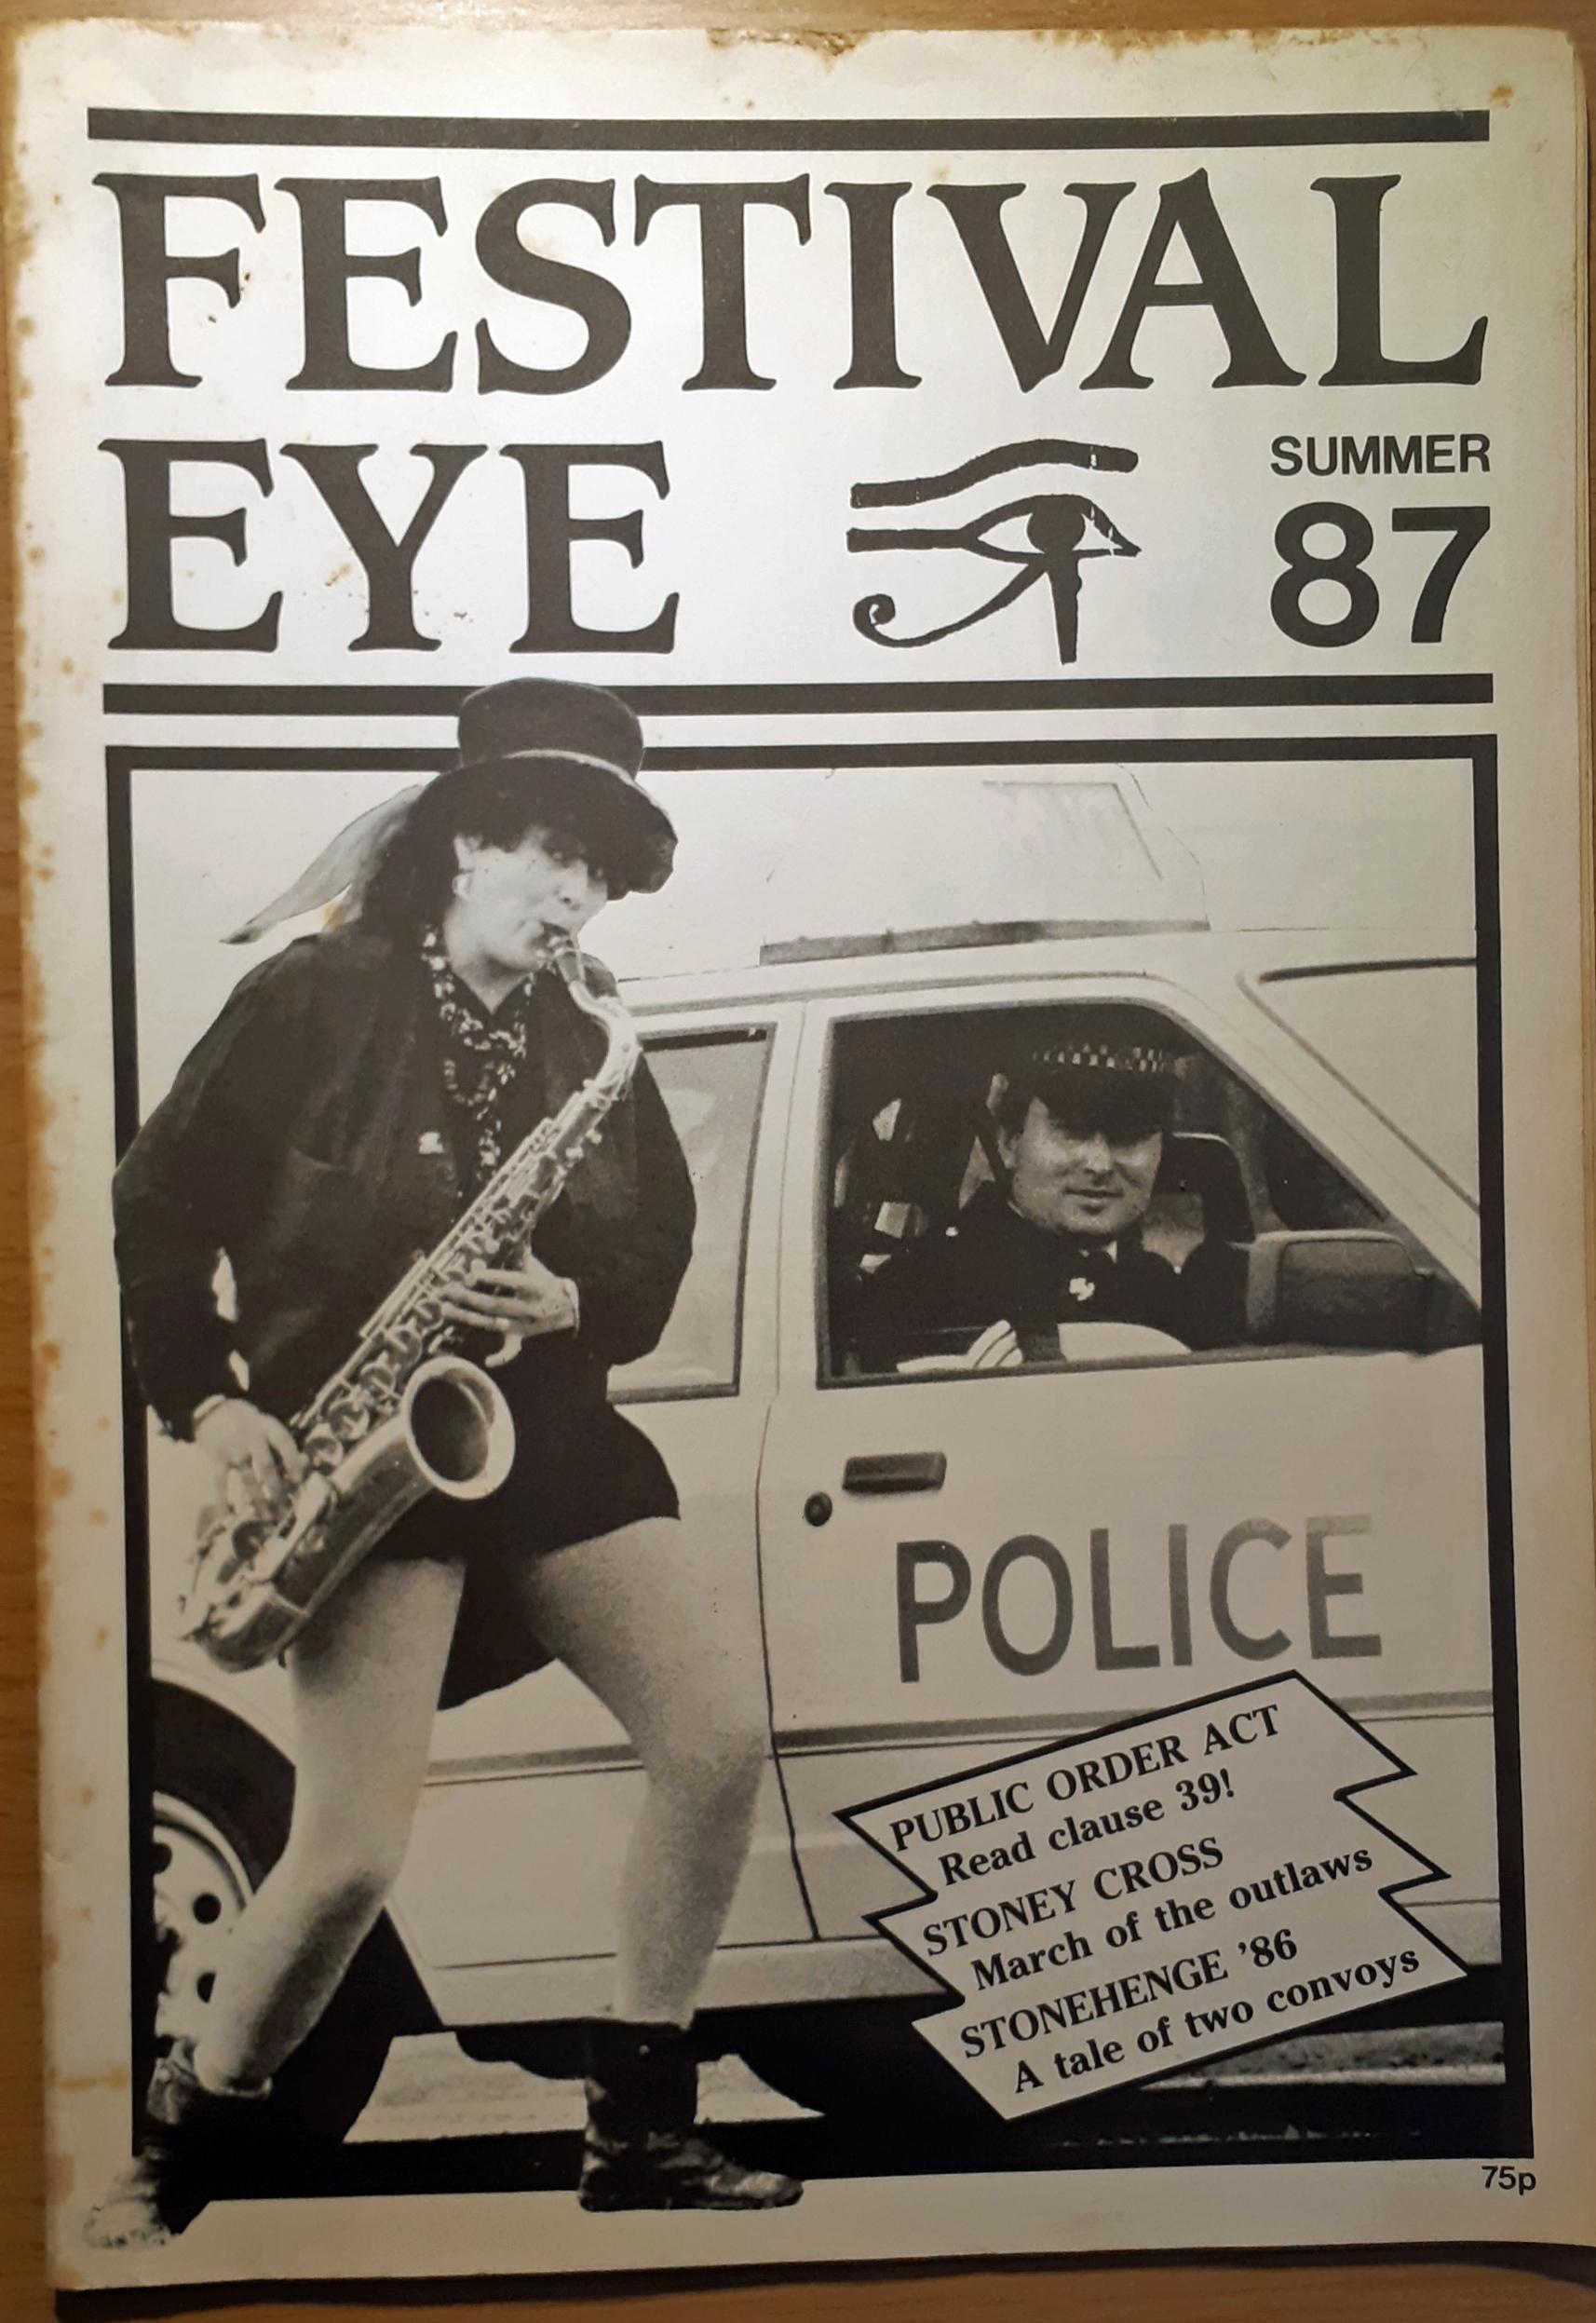 Festival eye 1987